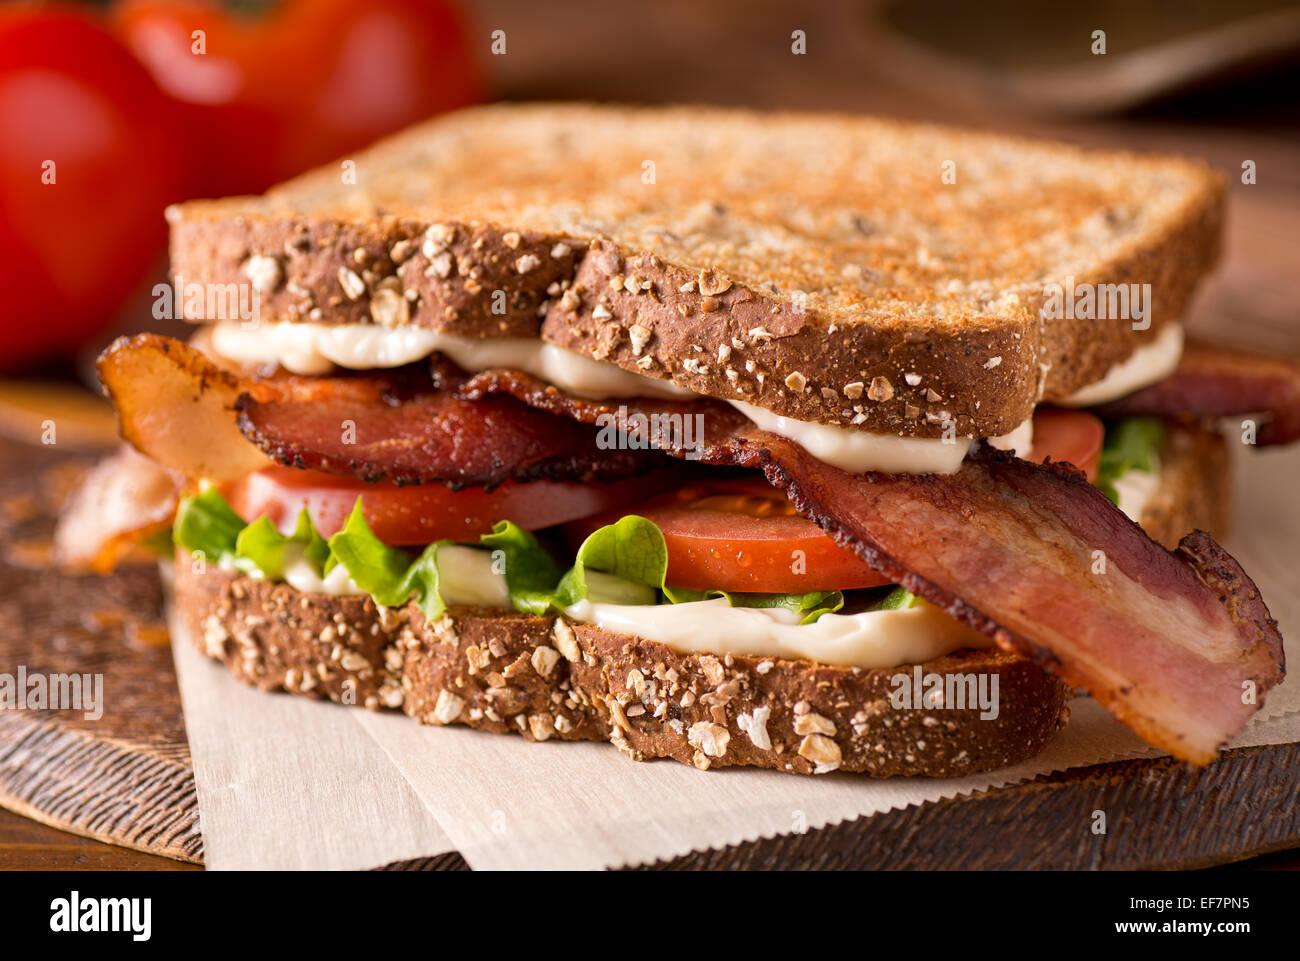 A delicious bacon, lettuce, and tomato blt sandwich. - Stock Image